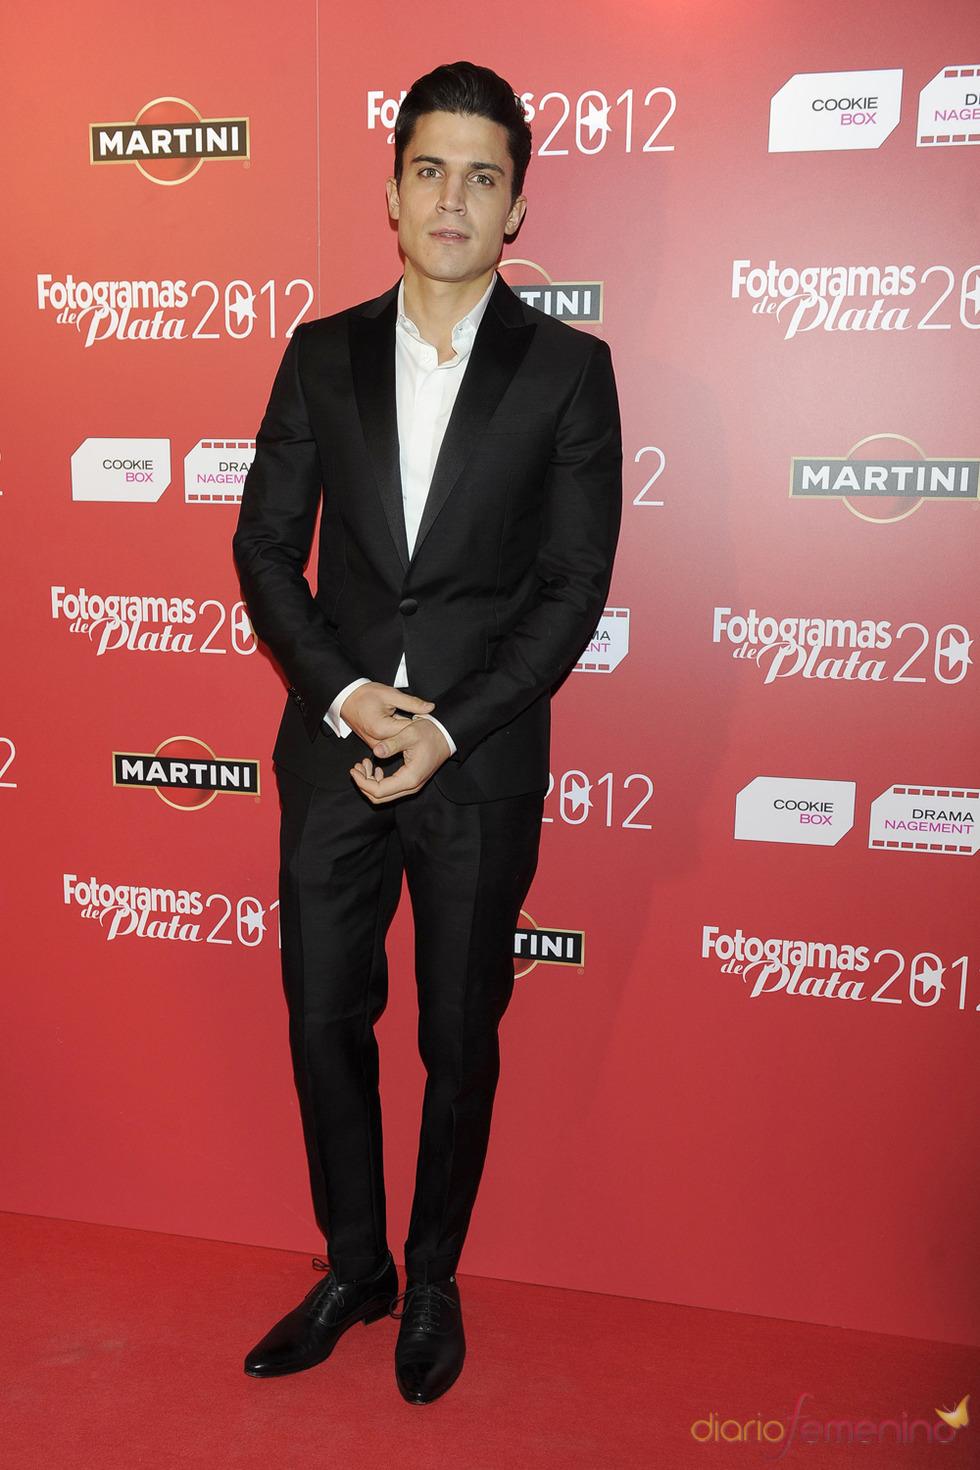 Alex González en la alfombra roja de los Fotogramas 2012